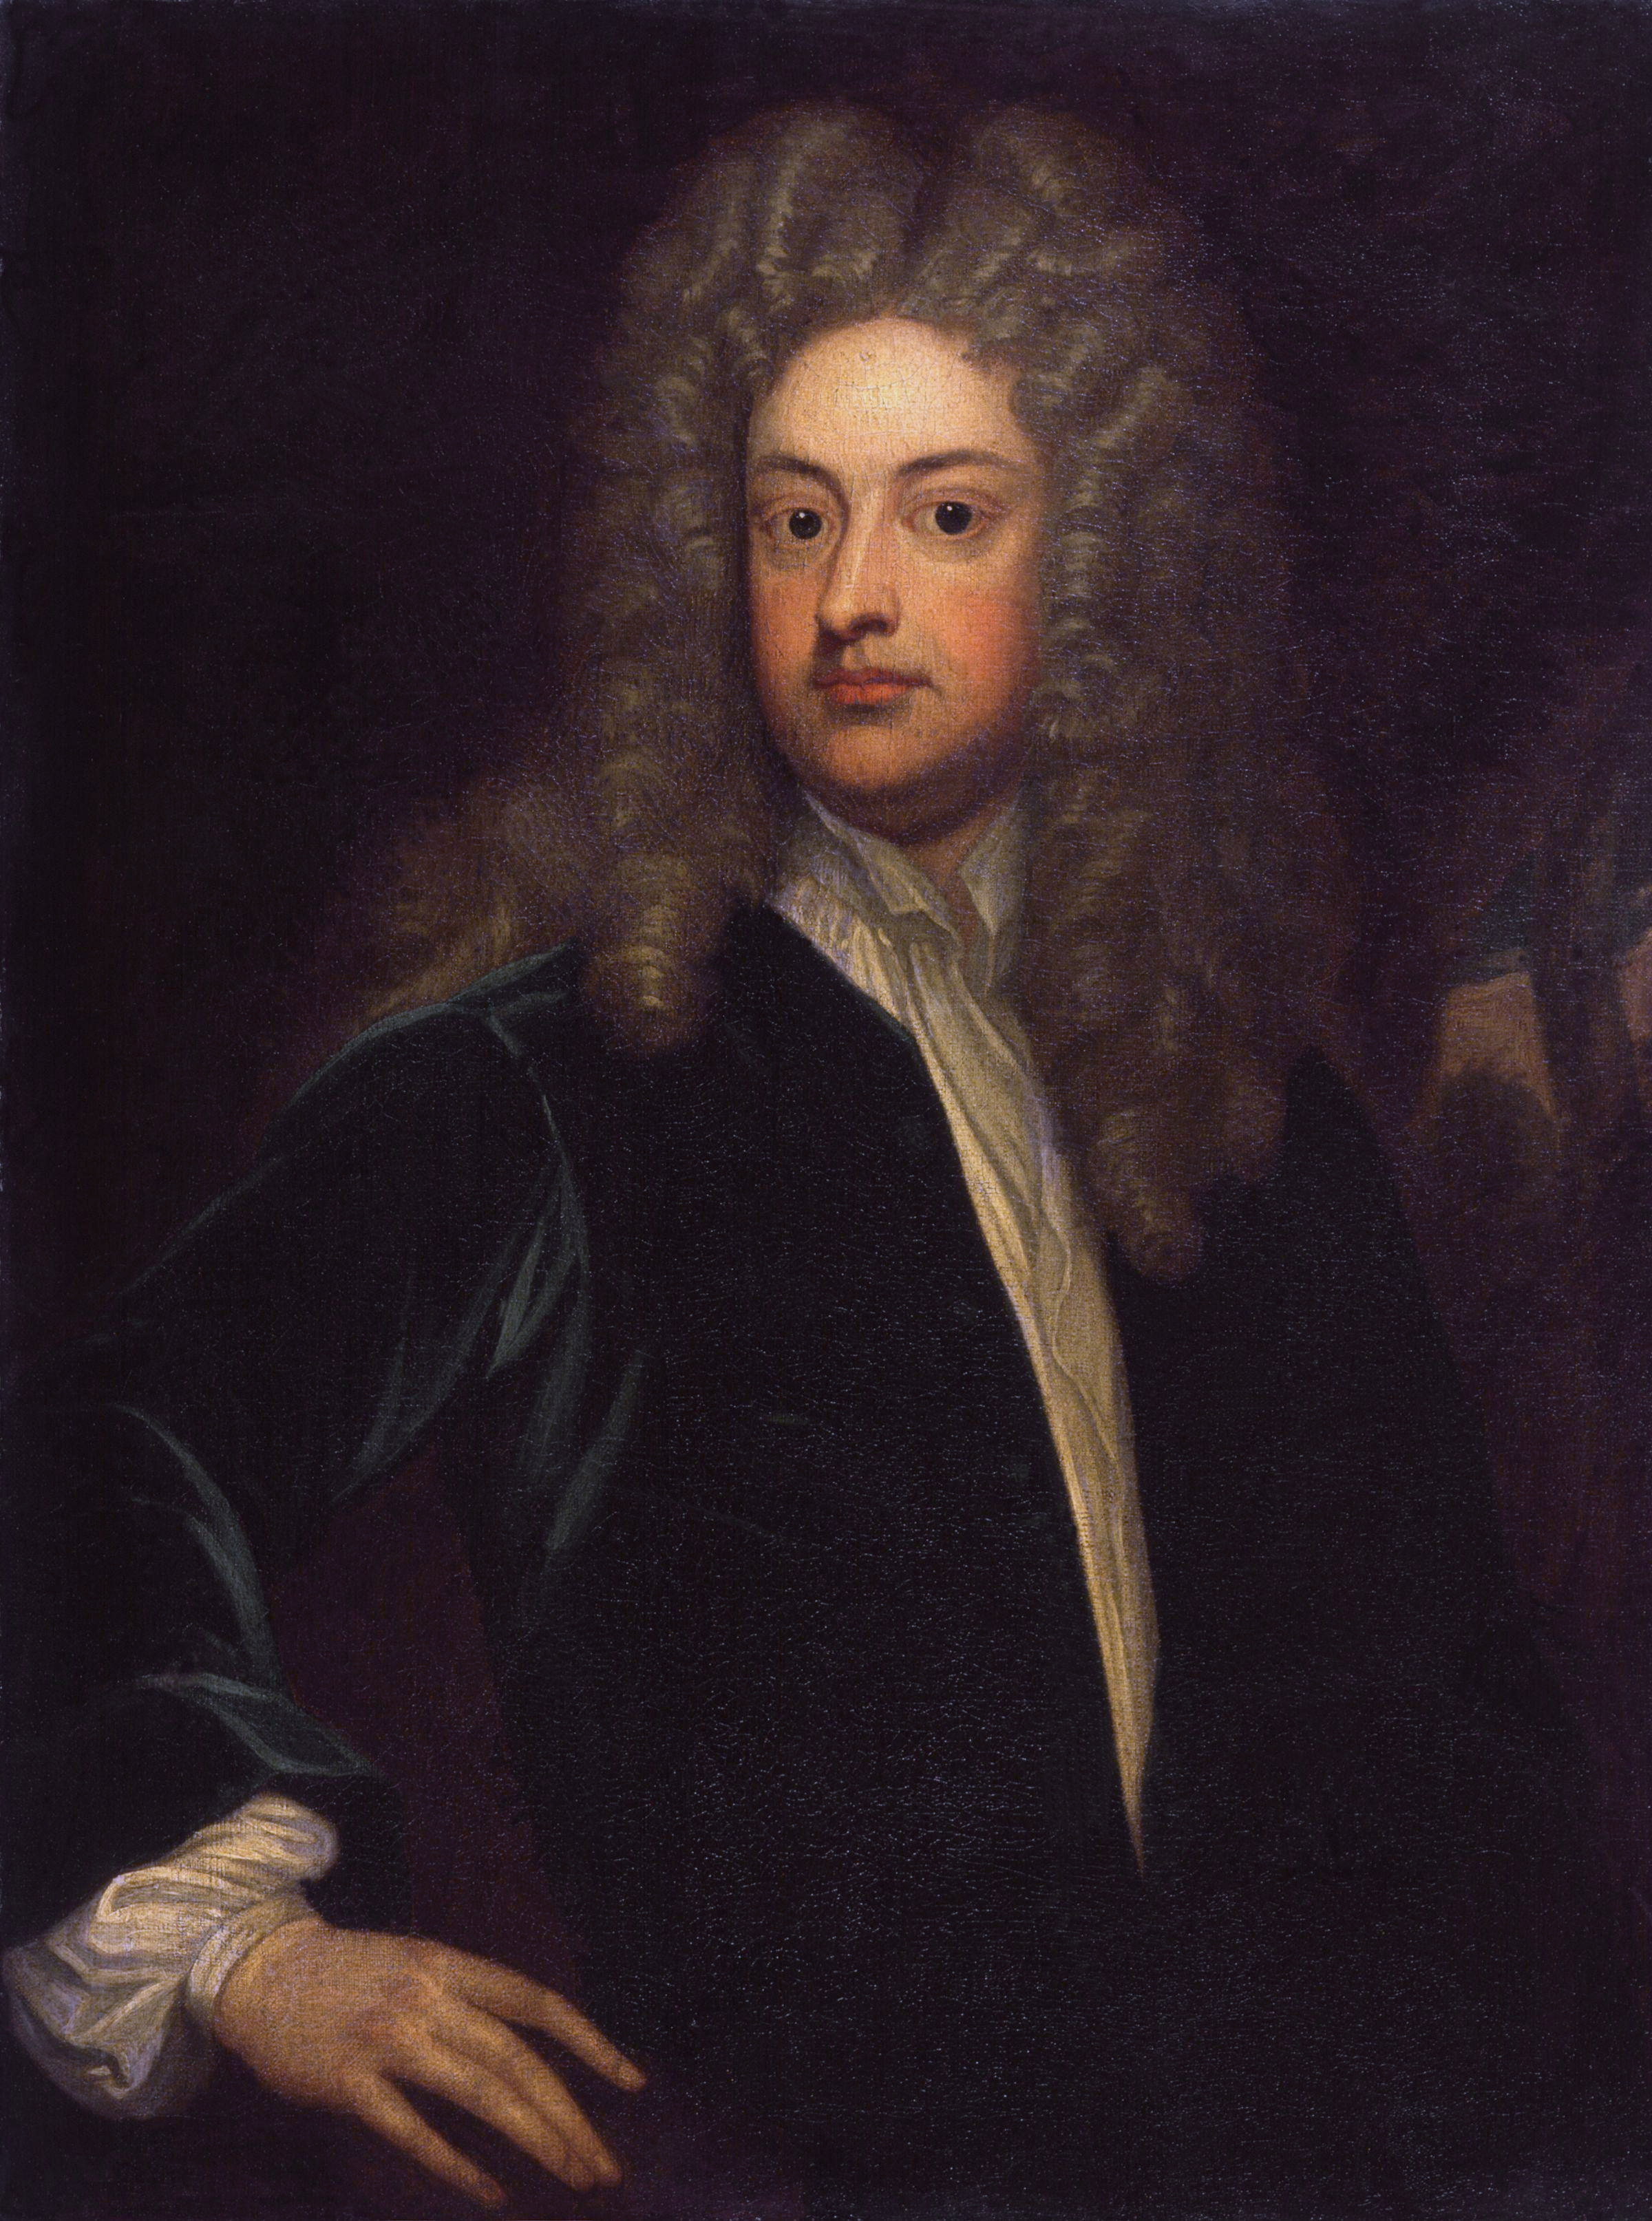 Joseph Addison by  Sir Godfrey Kneller